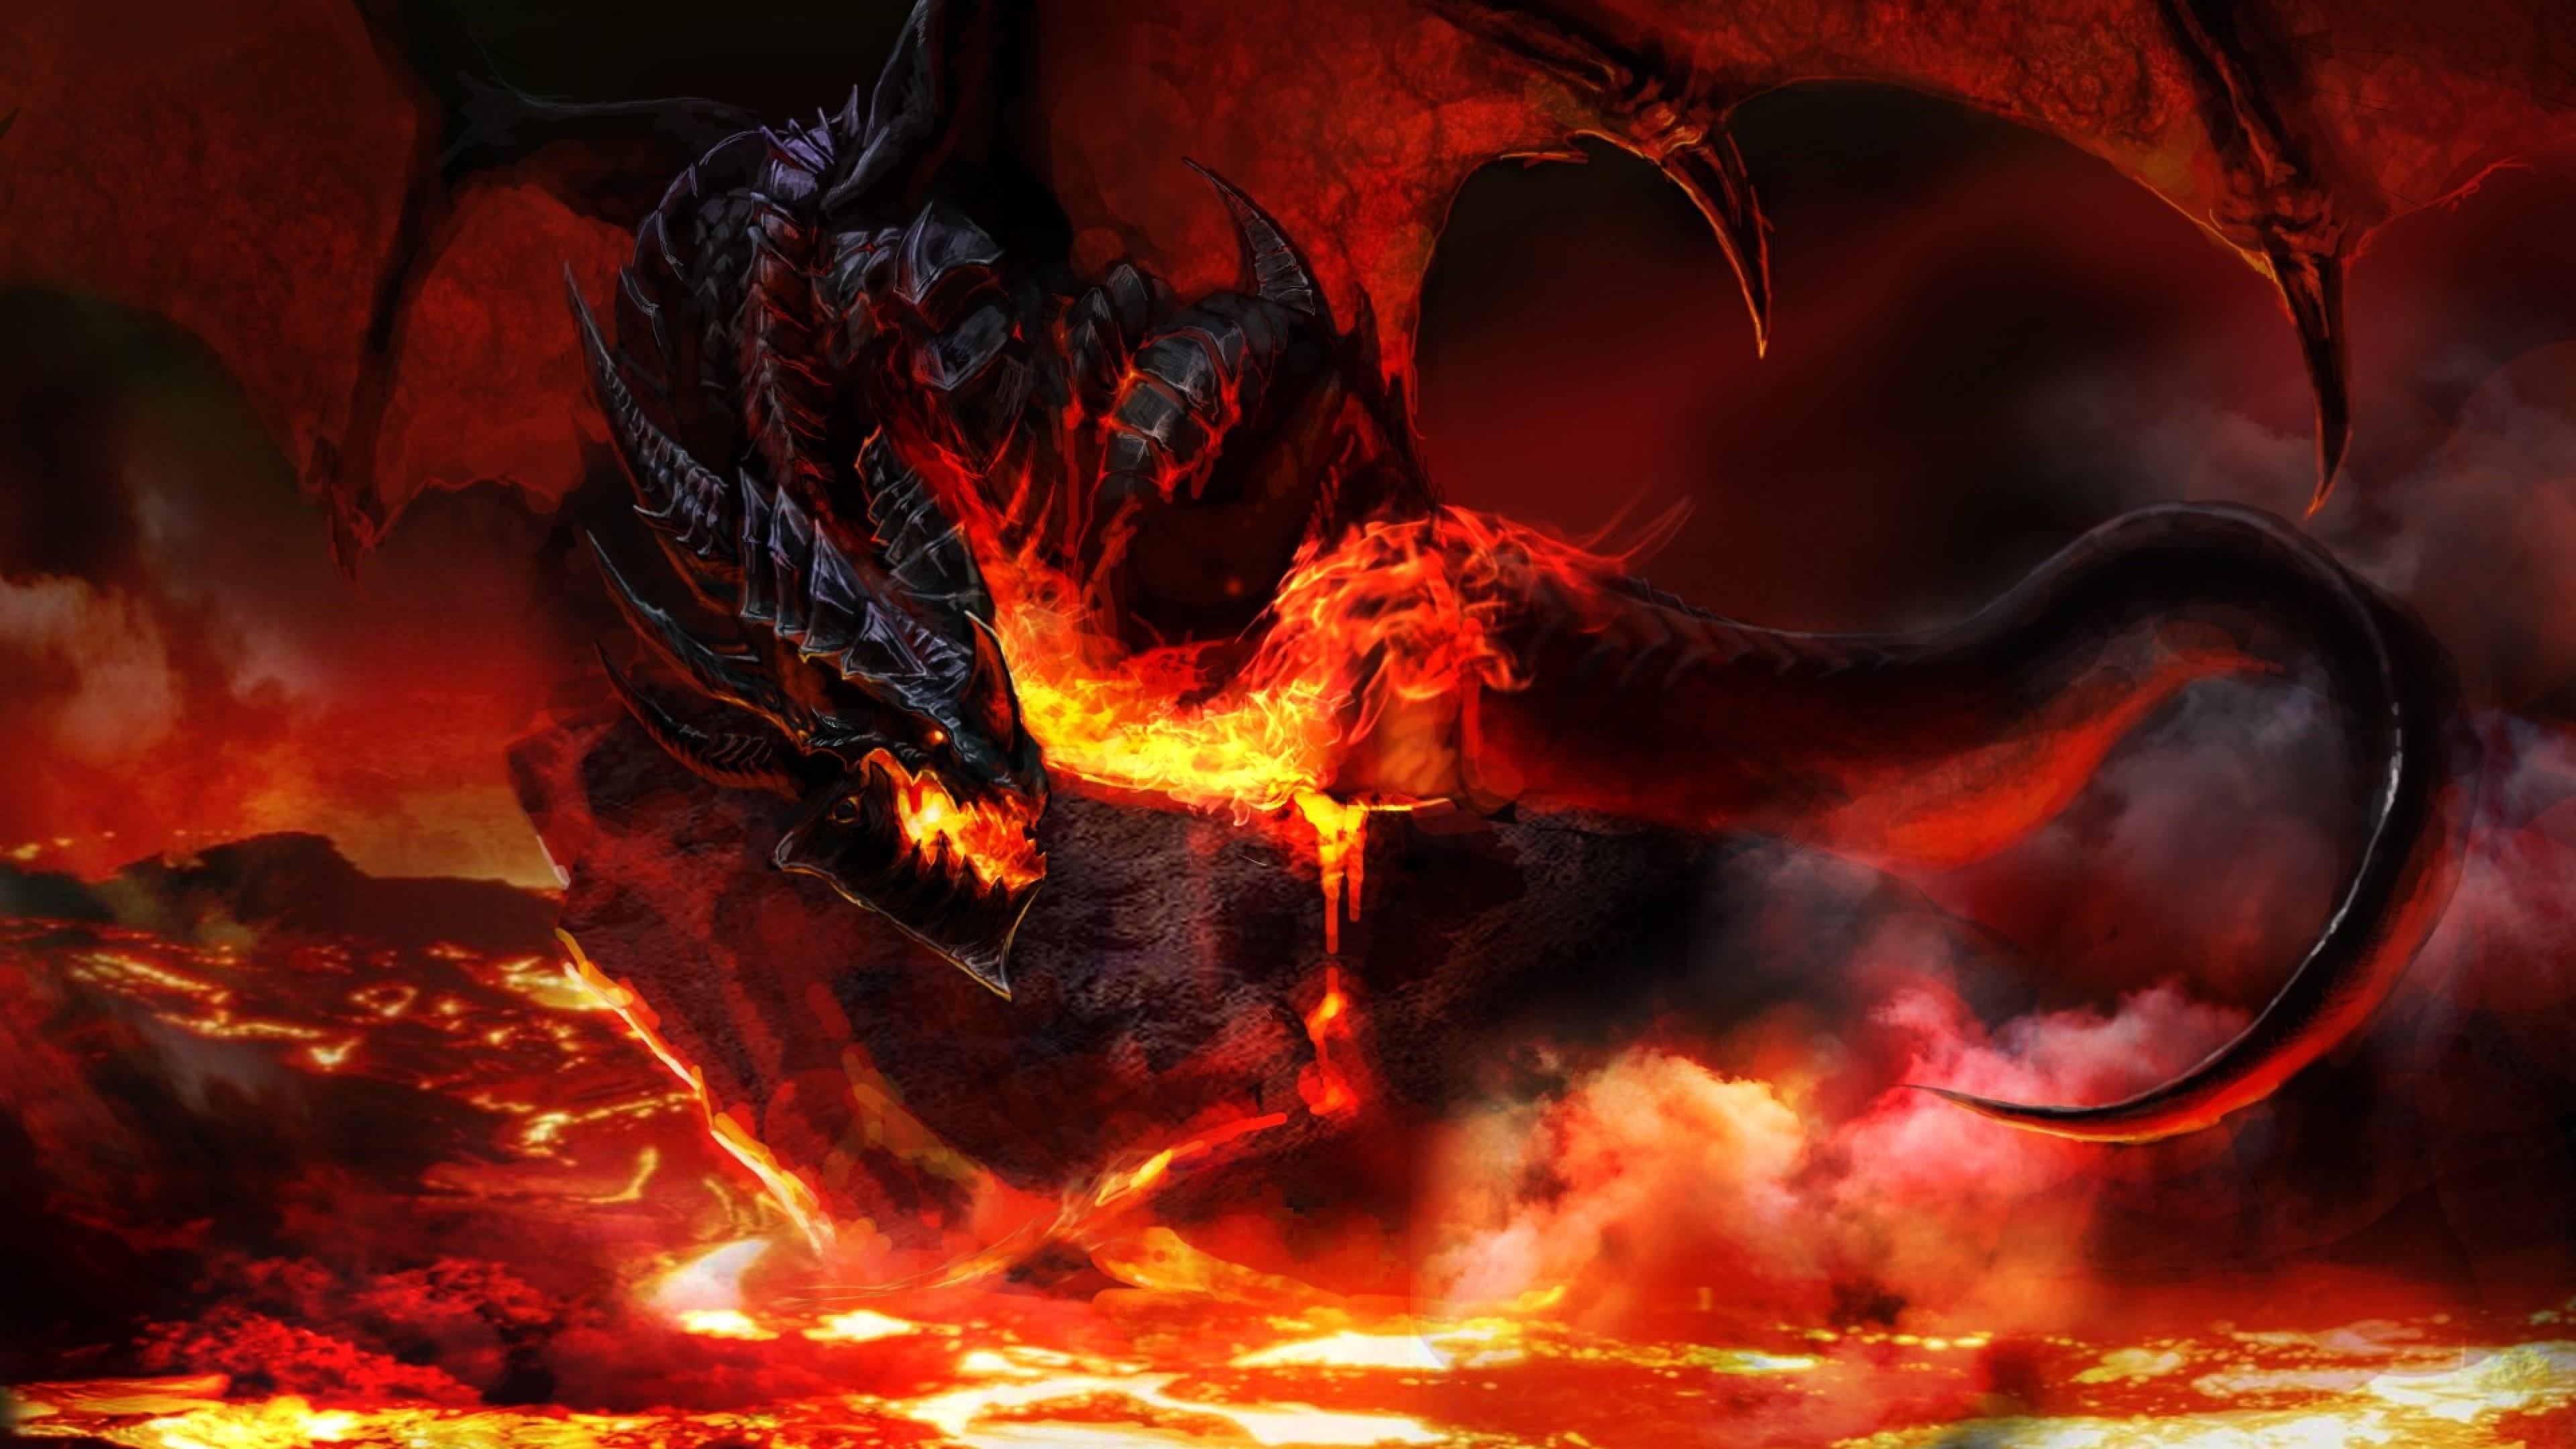 Download Wallpaper World of warcraft, Dragon, Fire, Tail 4K .